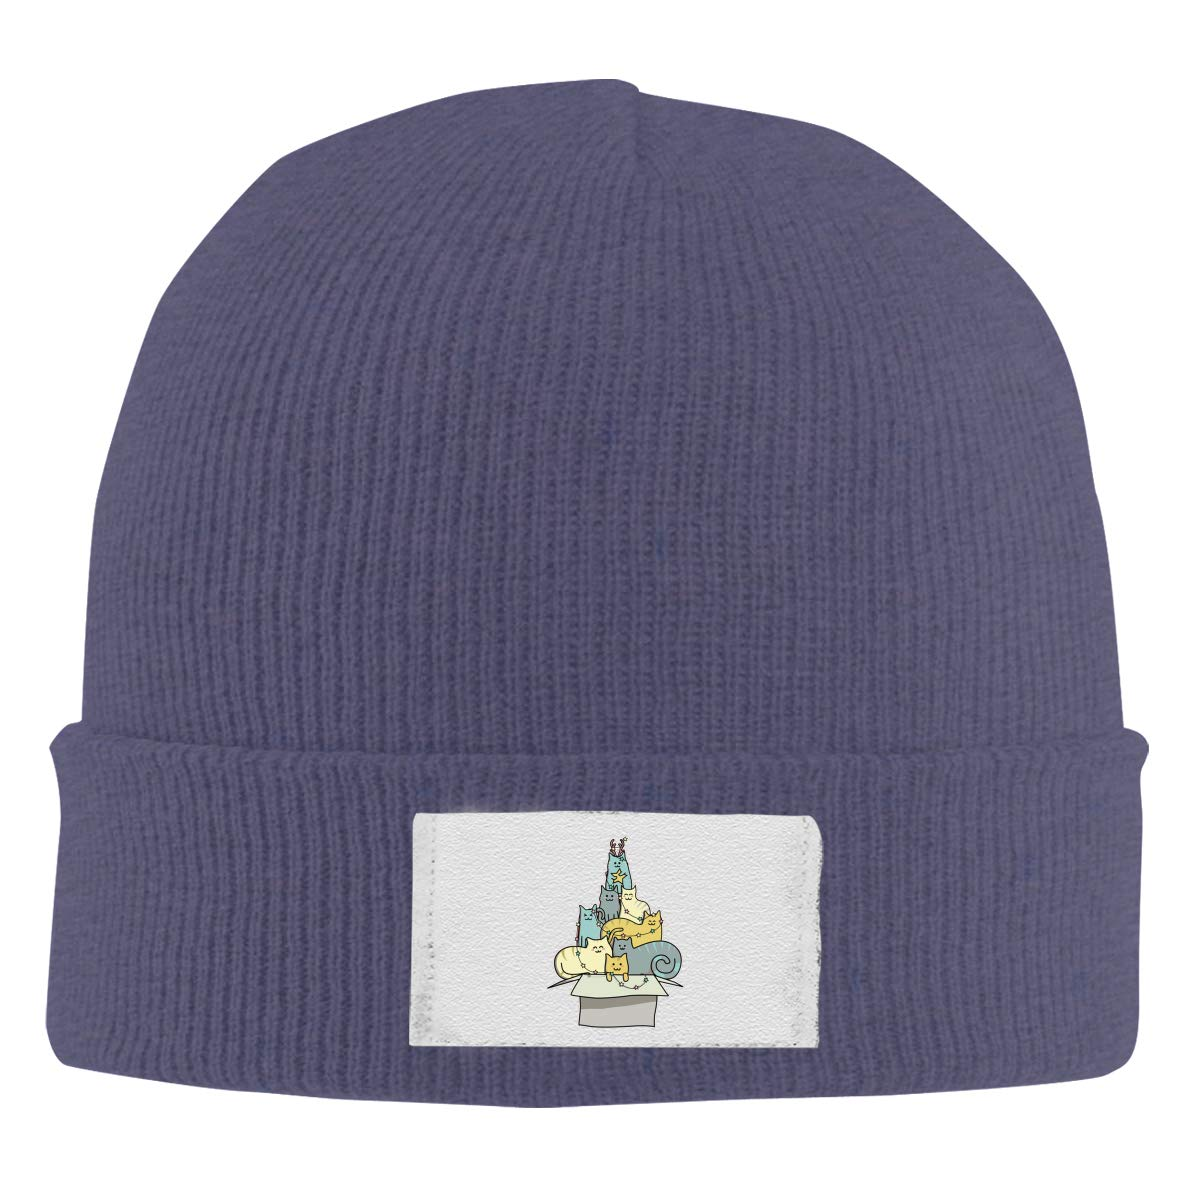 Stretchy Cuff Beanie Hat Black Skull Caps Cute Kawaii Cat Christmas Tree Winter Warm Knit Hats